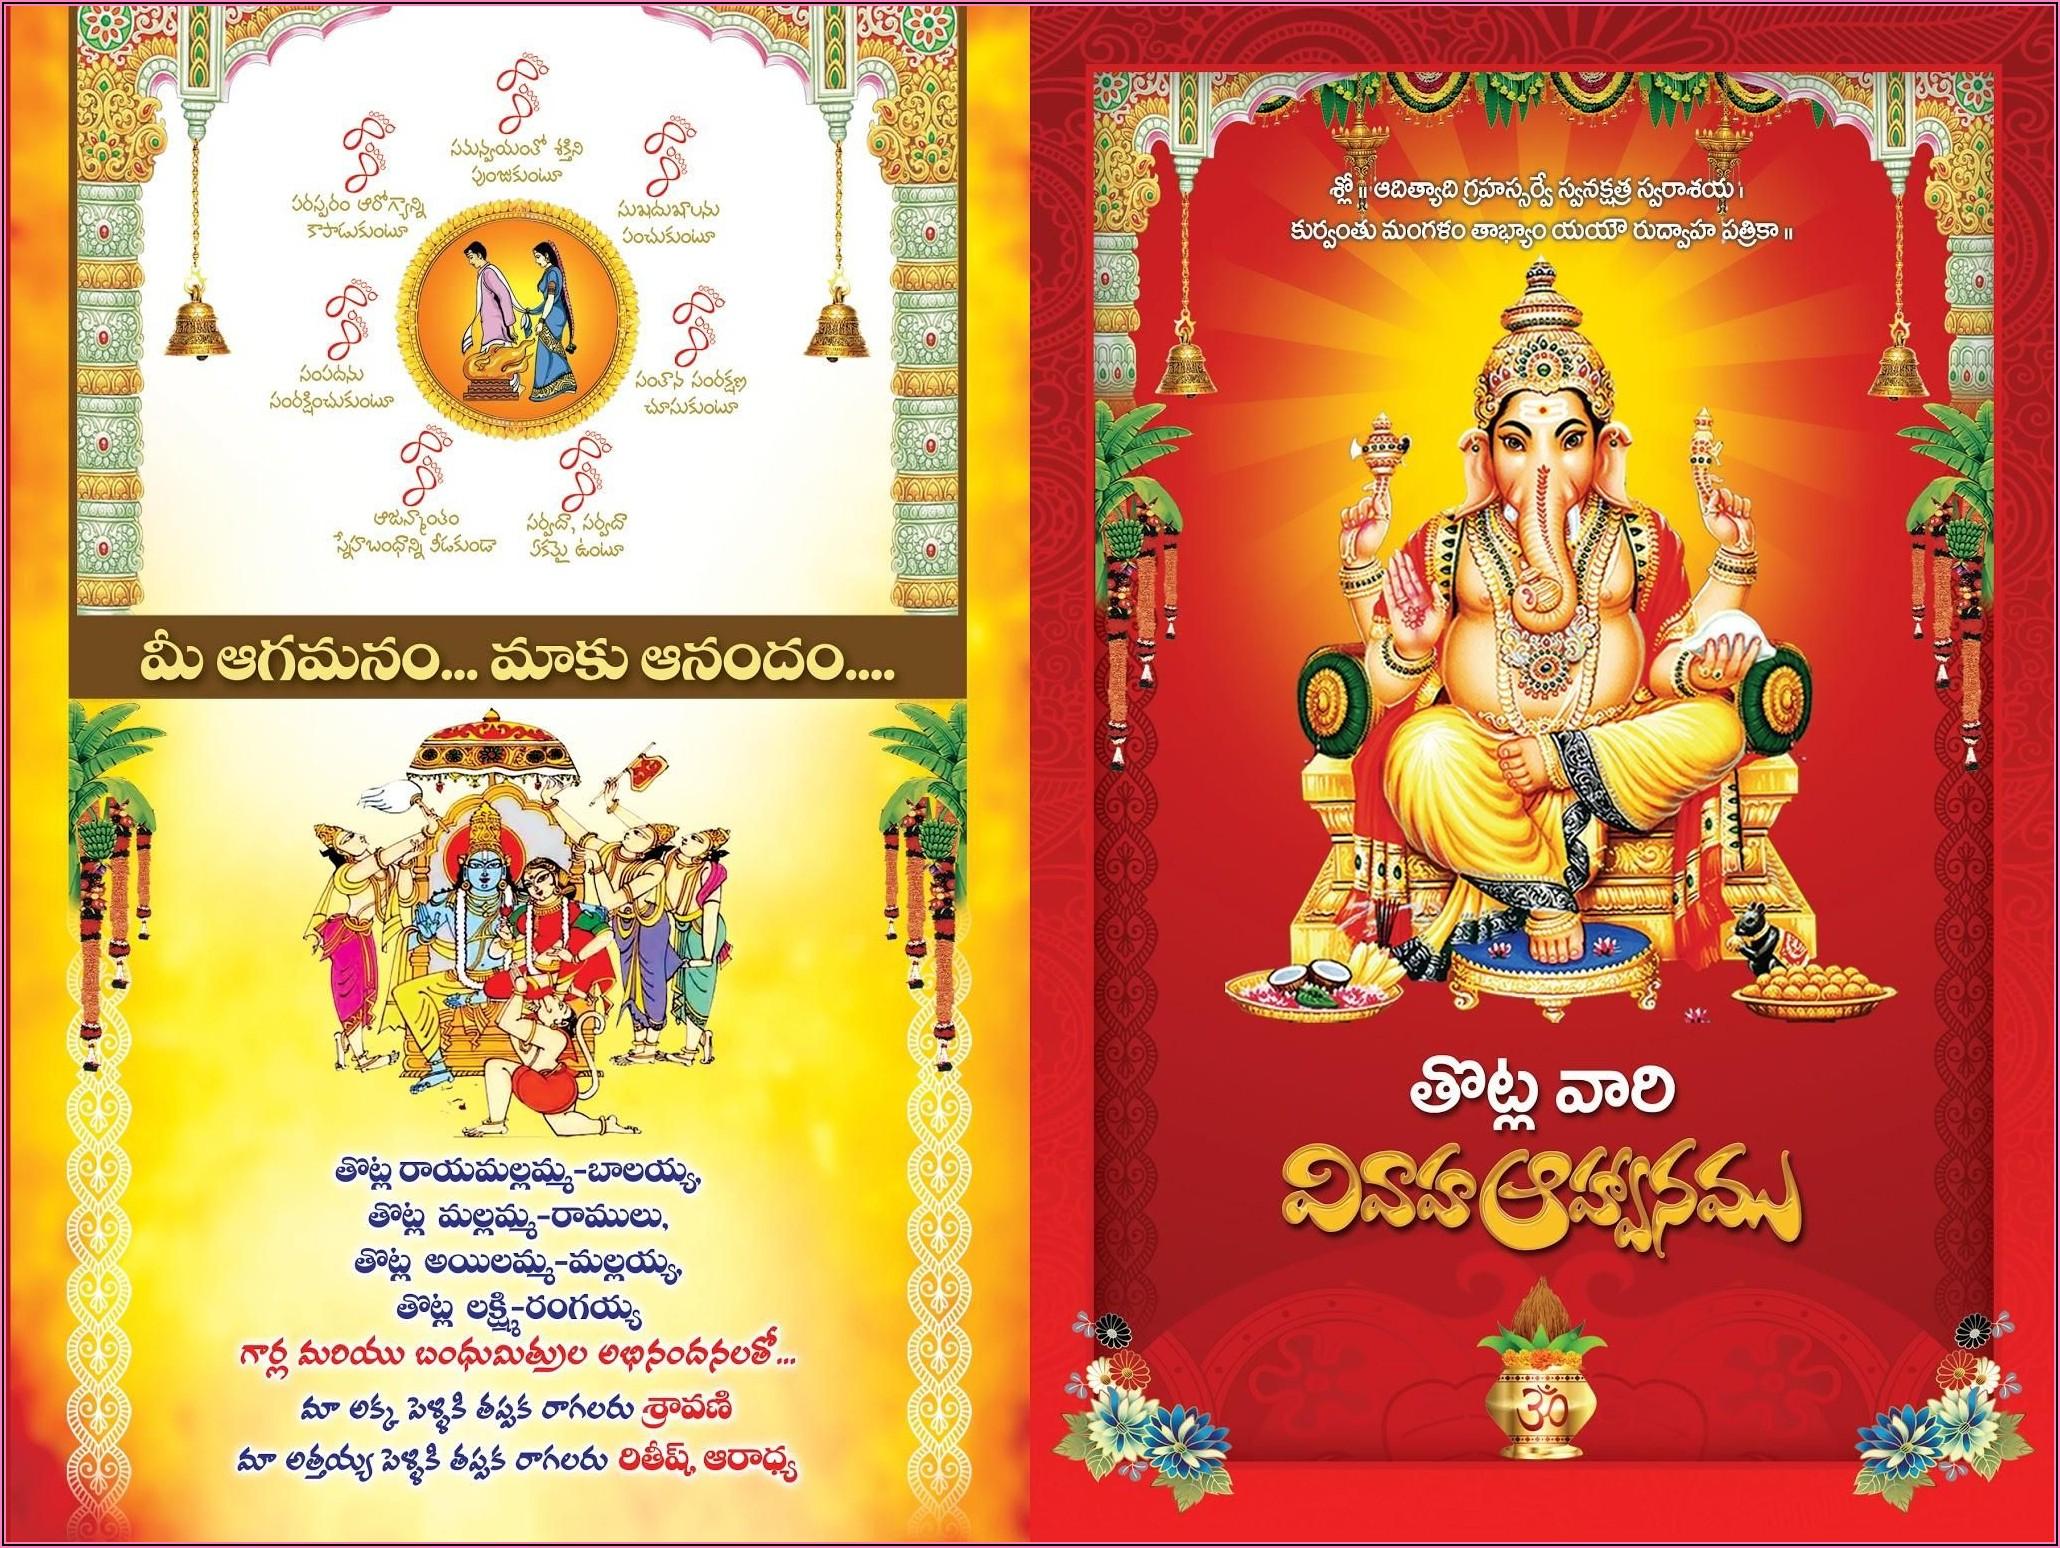 Indian Wedding Invitation Card Design Free Download